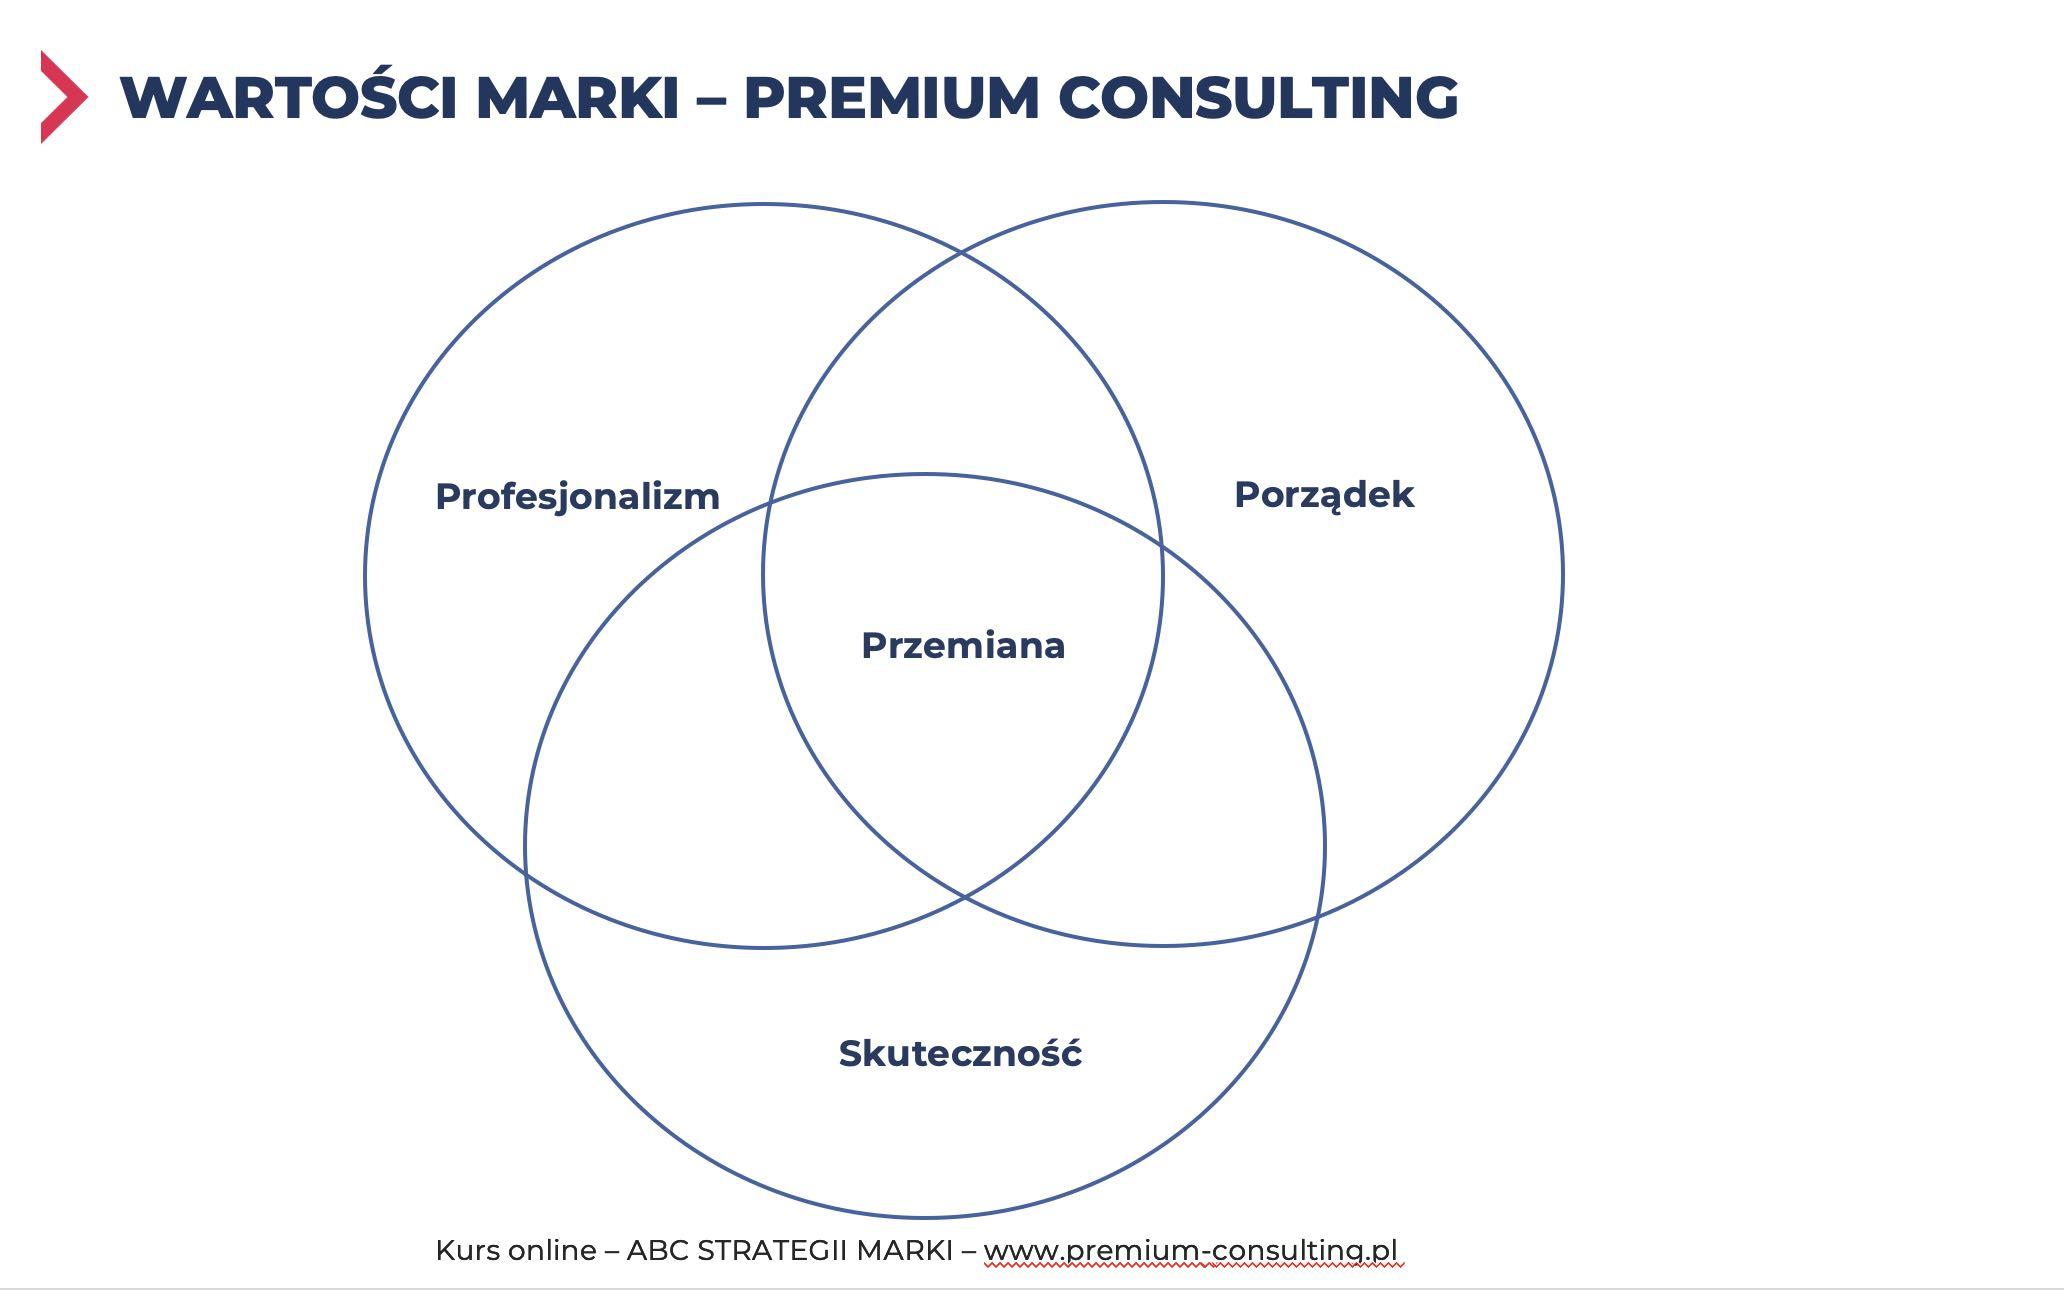 wartosci marki premium consulting